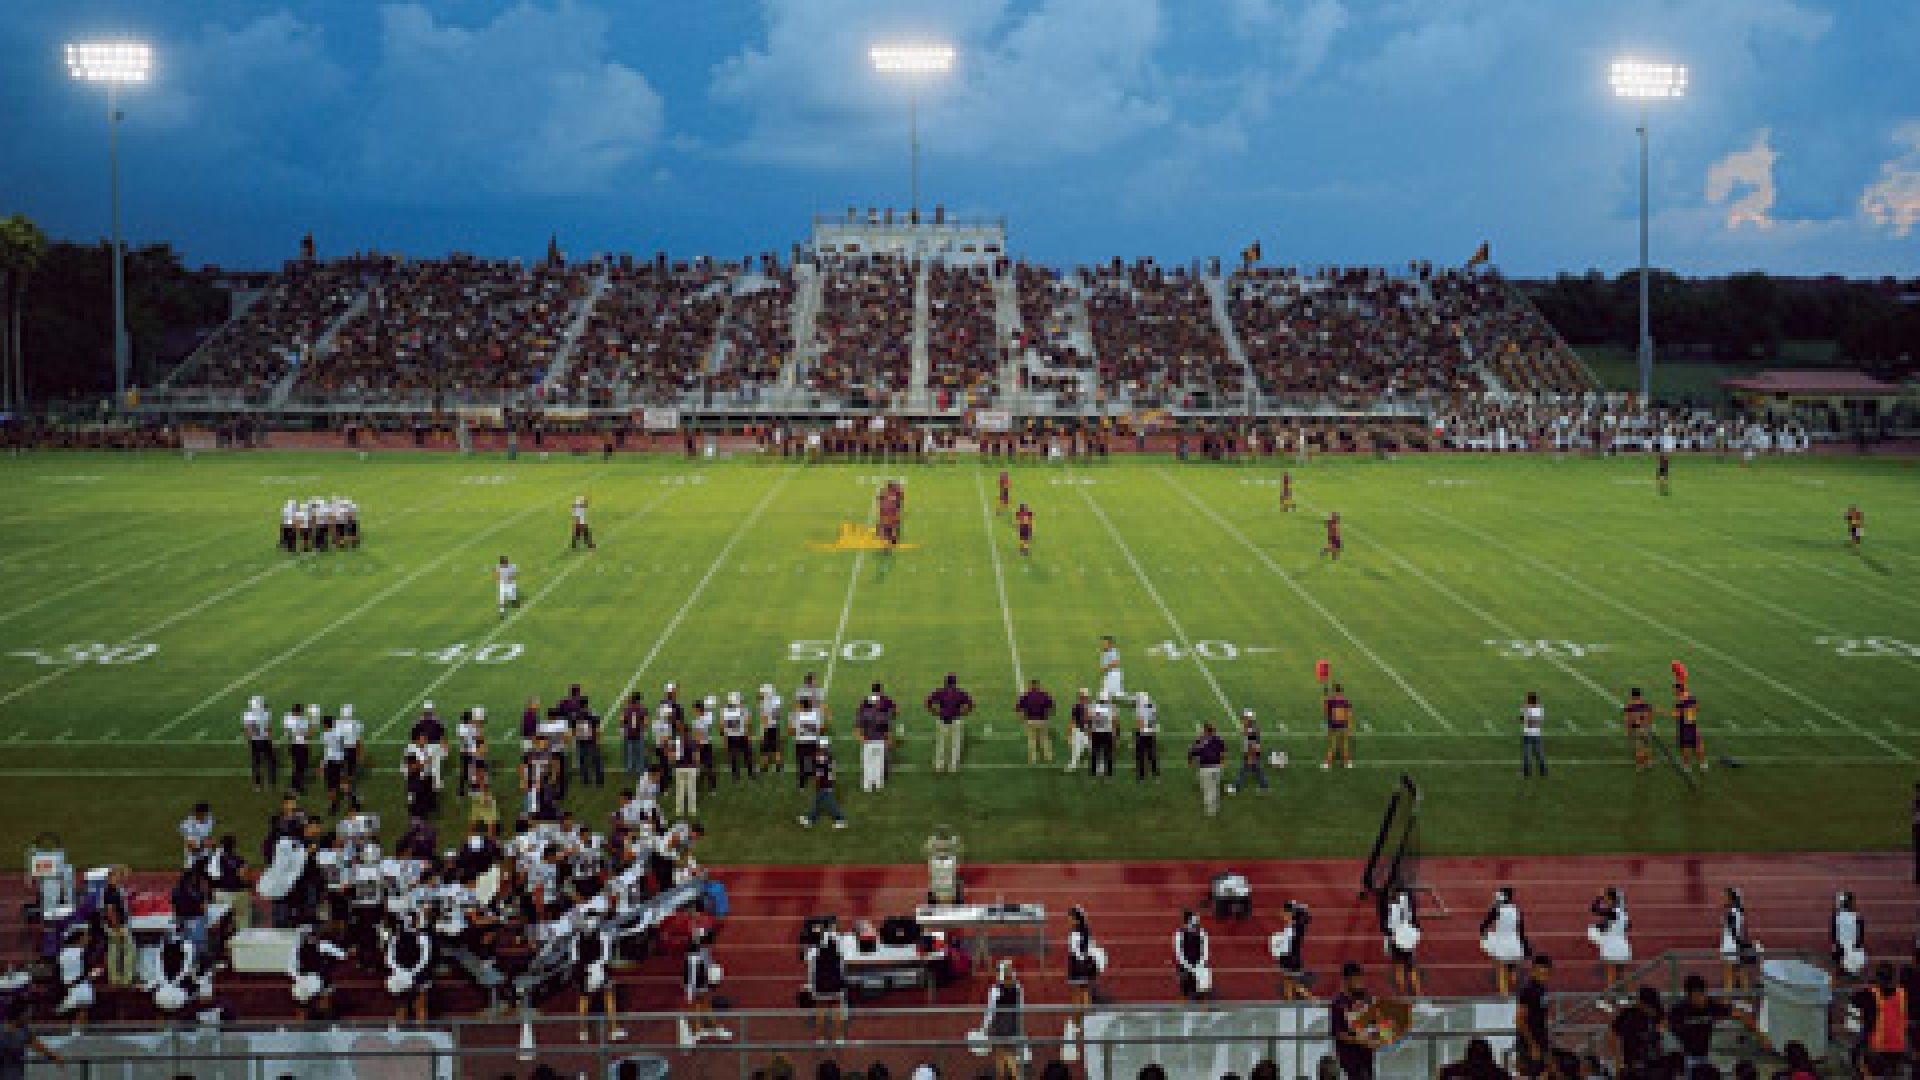 Leo Aguilar Memorial Stadium, Los Fresnos High School, Los Fresnos, Texas | 09.03.10 7:48 P.M.